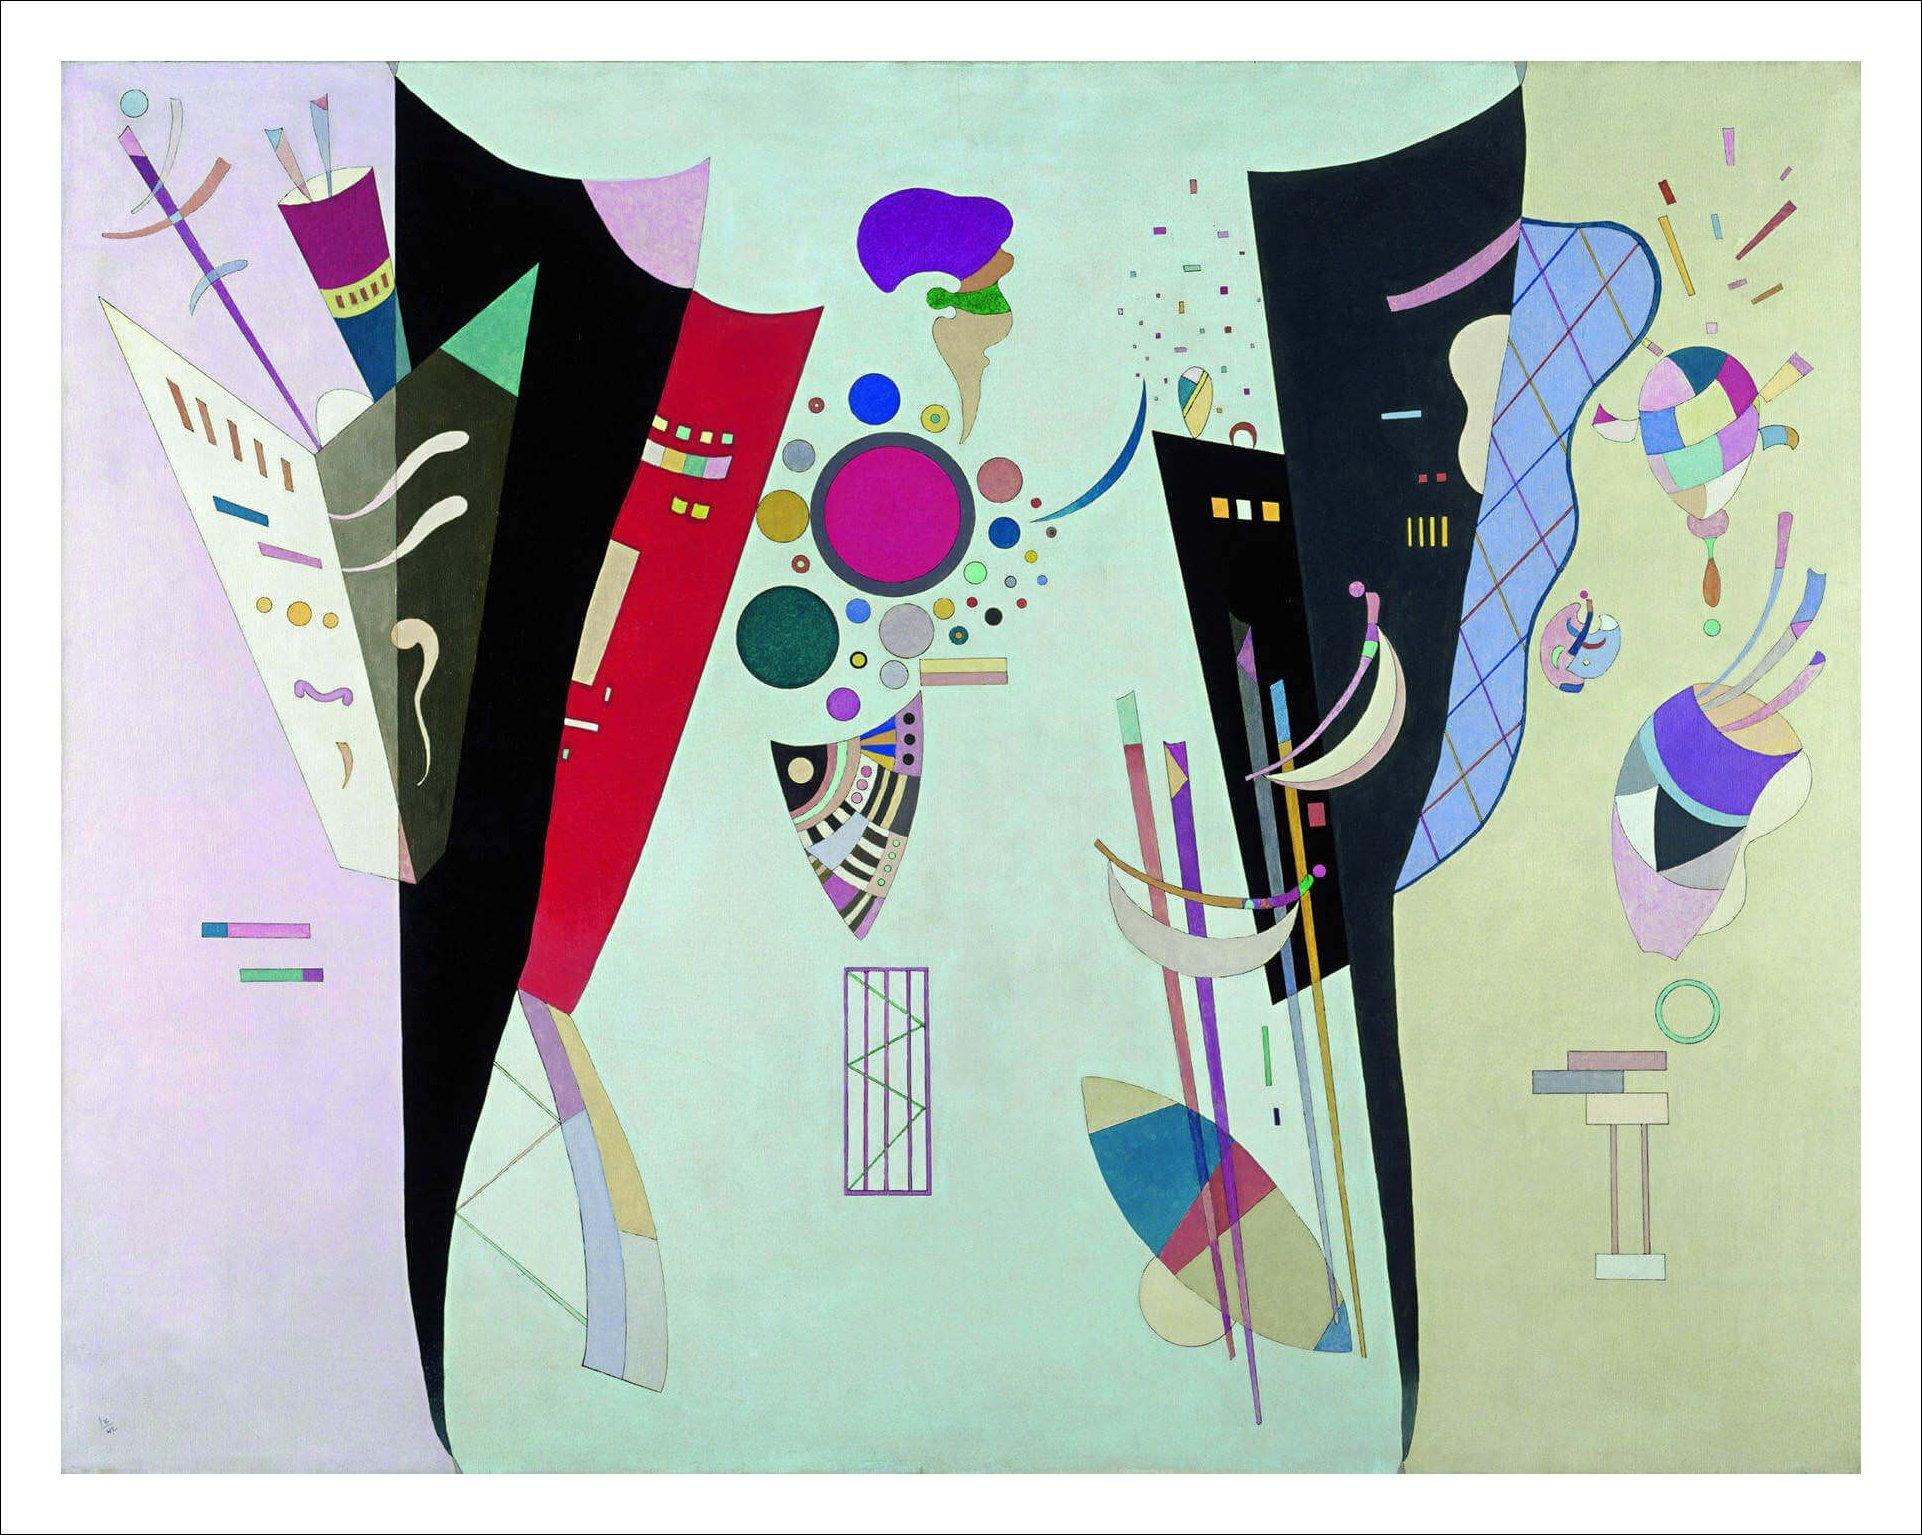 Vasilij Kandinsky - Accordo reciproco